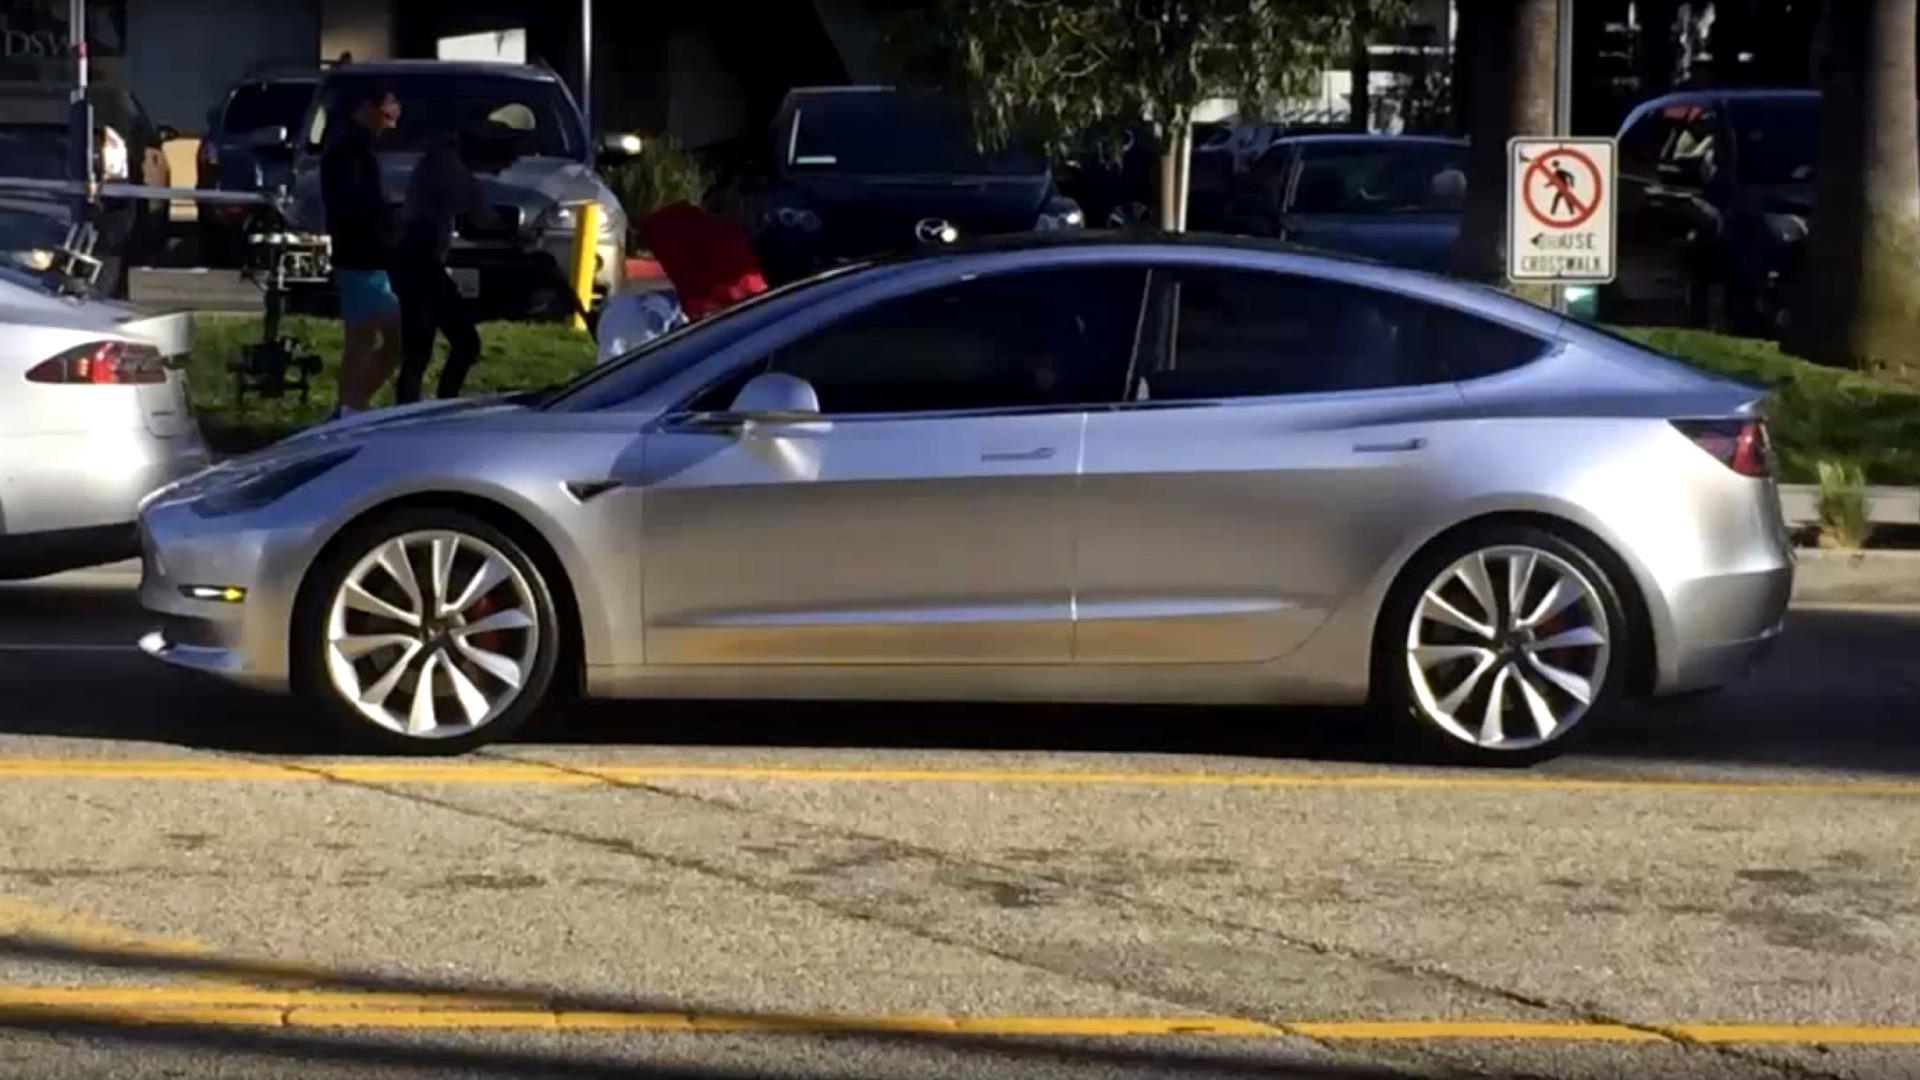 Tesla Model 3 spotted in broad daylight filming